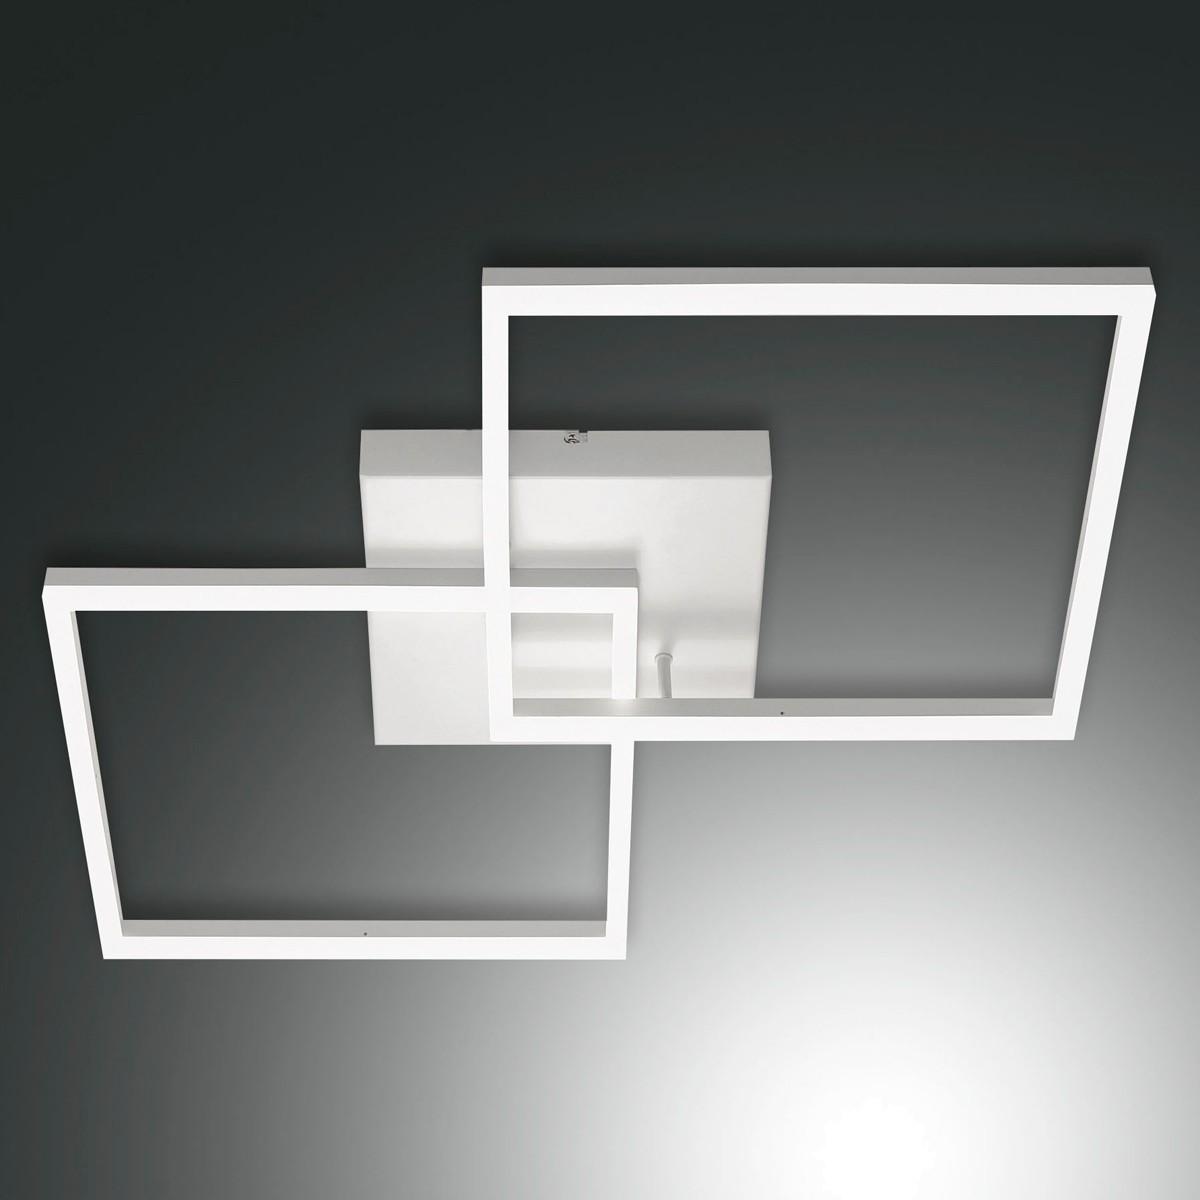 Fabas Luce Bard 3394-65 LED Deckenleuchte, weiß